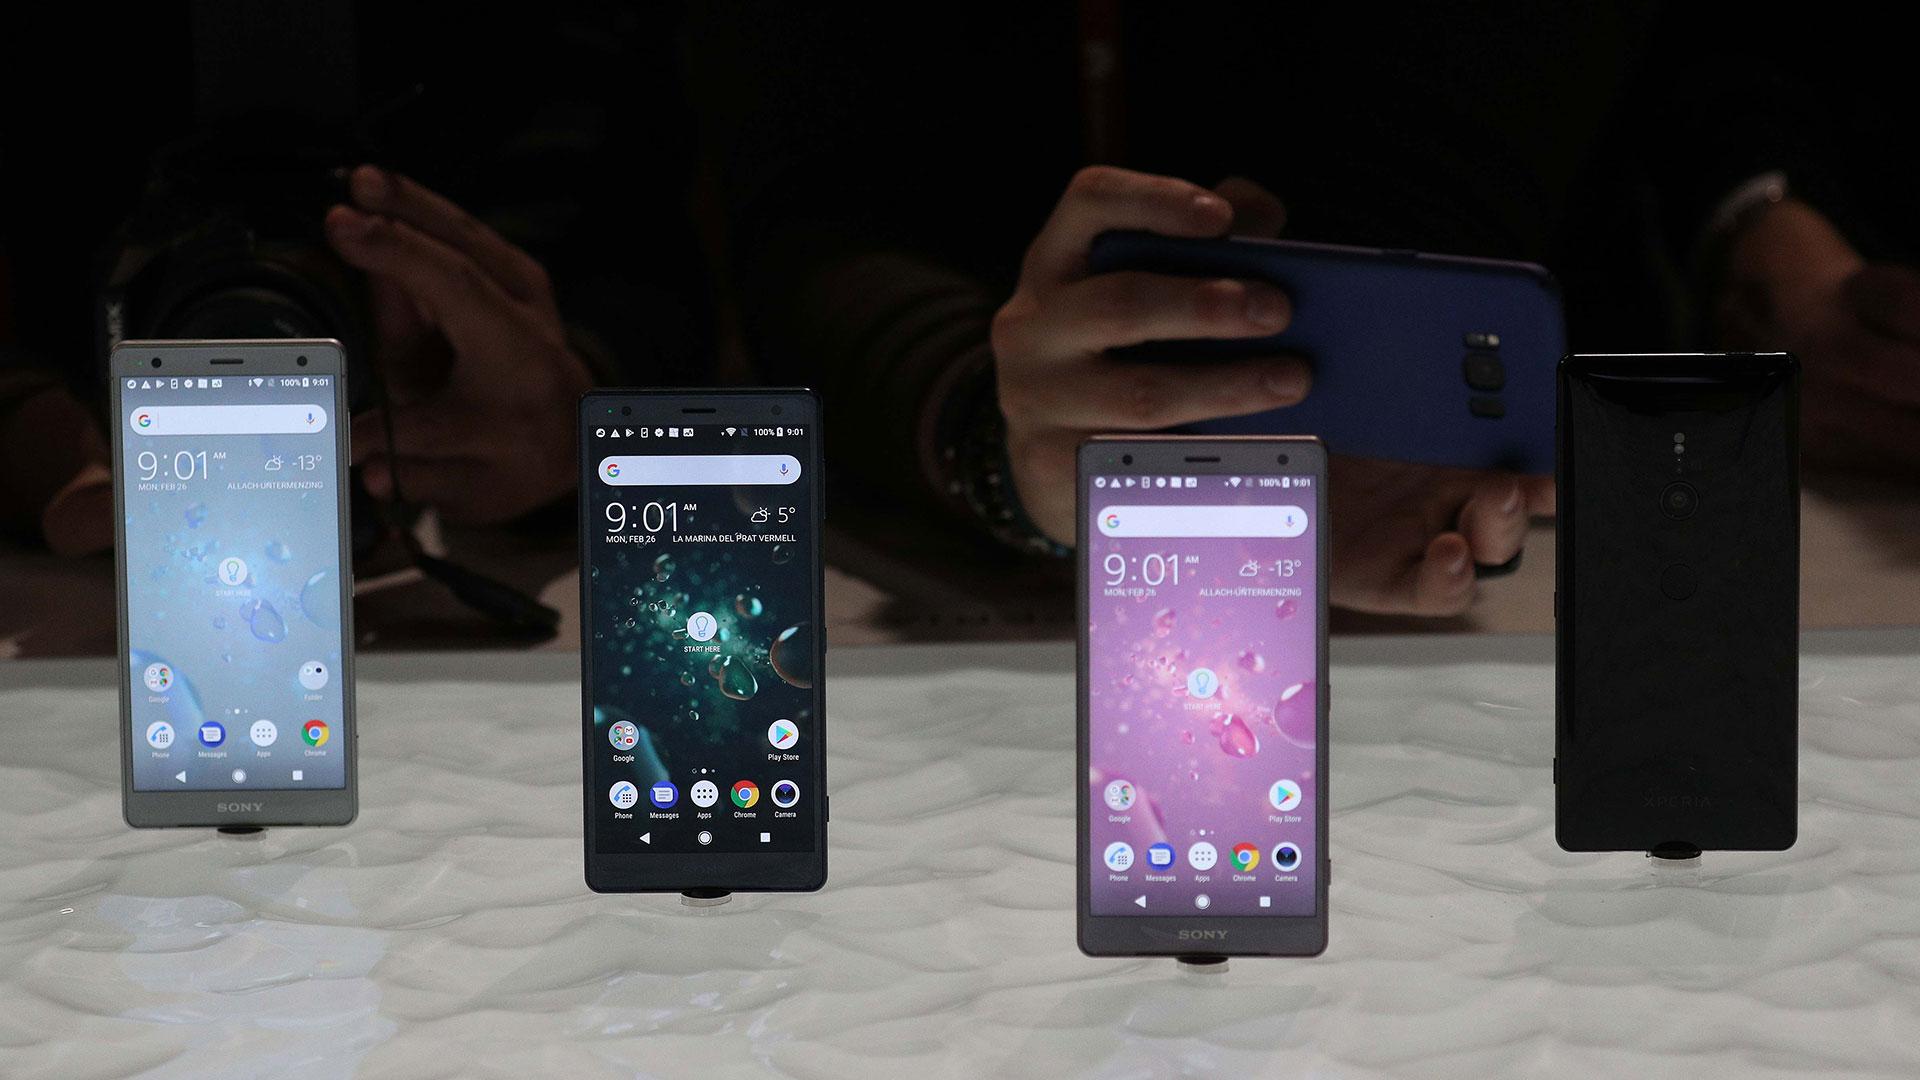 El Sony Xperia XZ2 permite grabar videos en súper cámara lenta: 960 fotogramas por segundo en Full HD o 1080p. (Reuters)